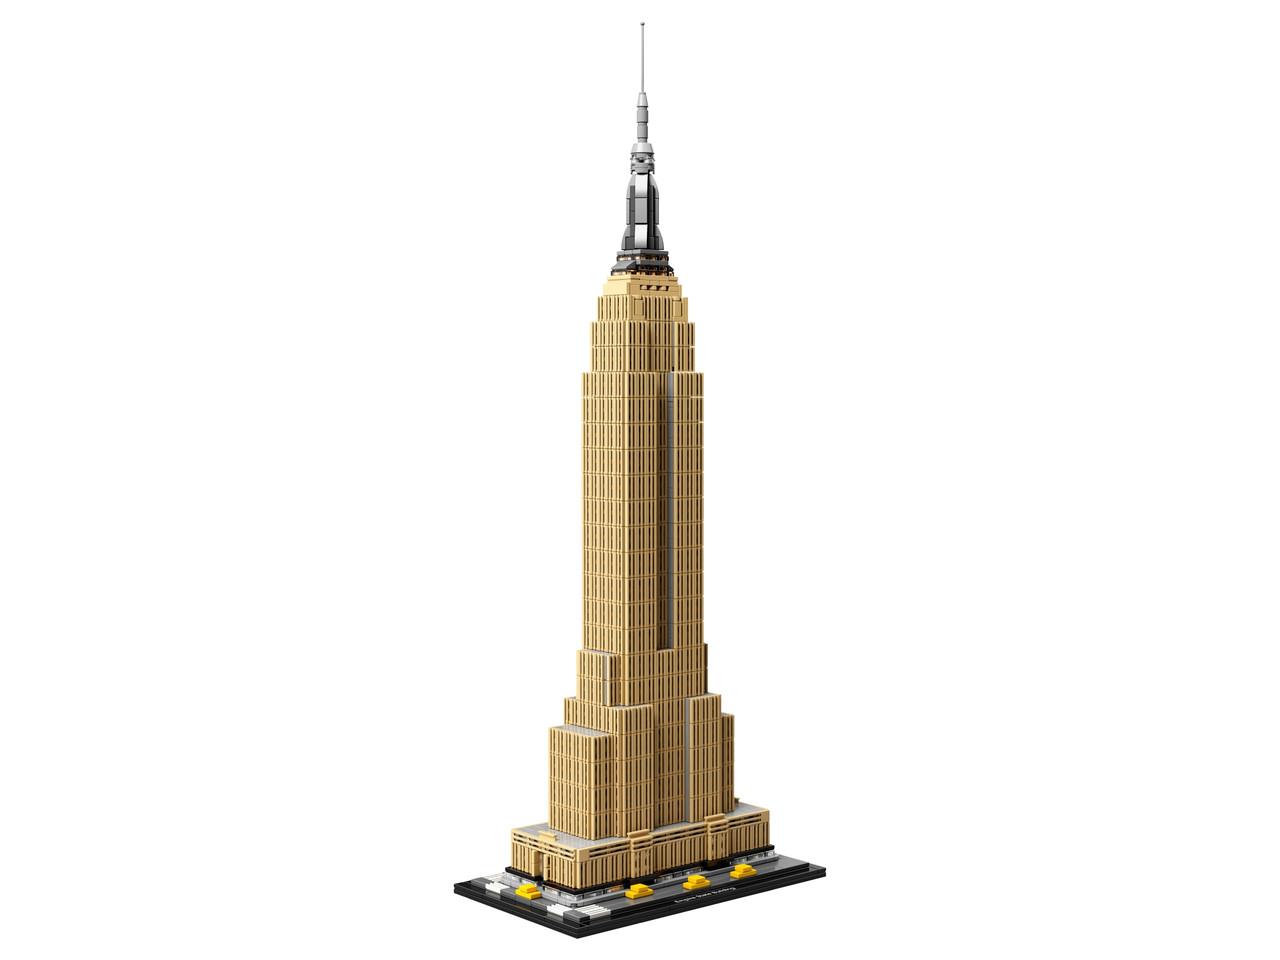 Конструктор LEGO Небоскреб Эмпайр-стейт-билдинг 1767 деталей (21046)